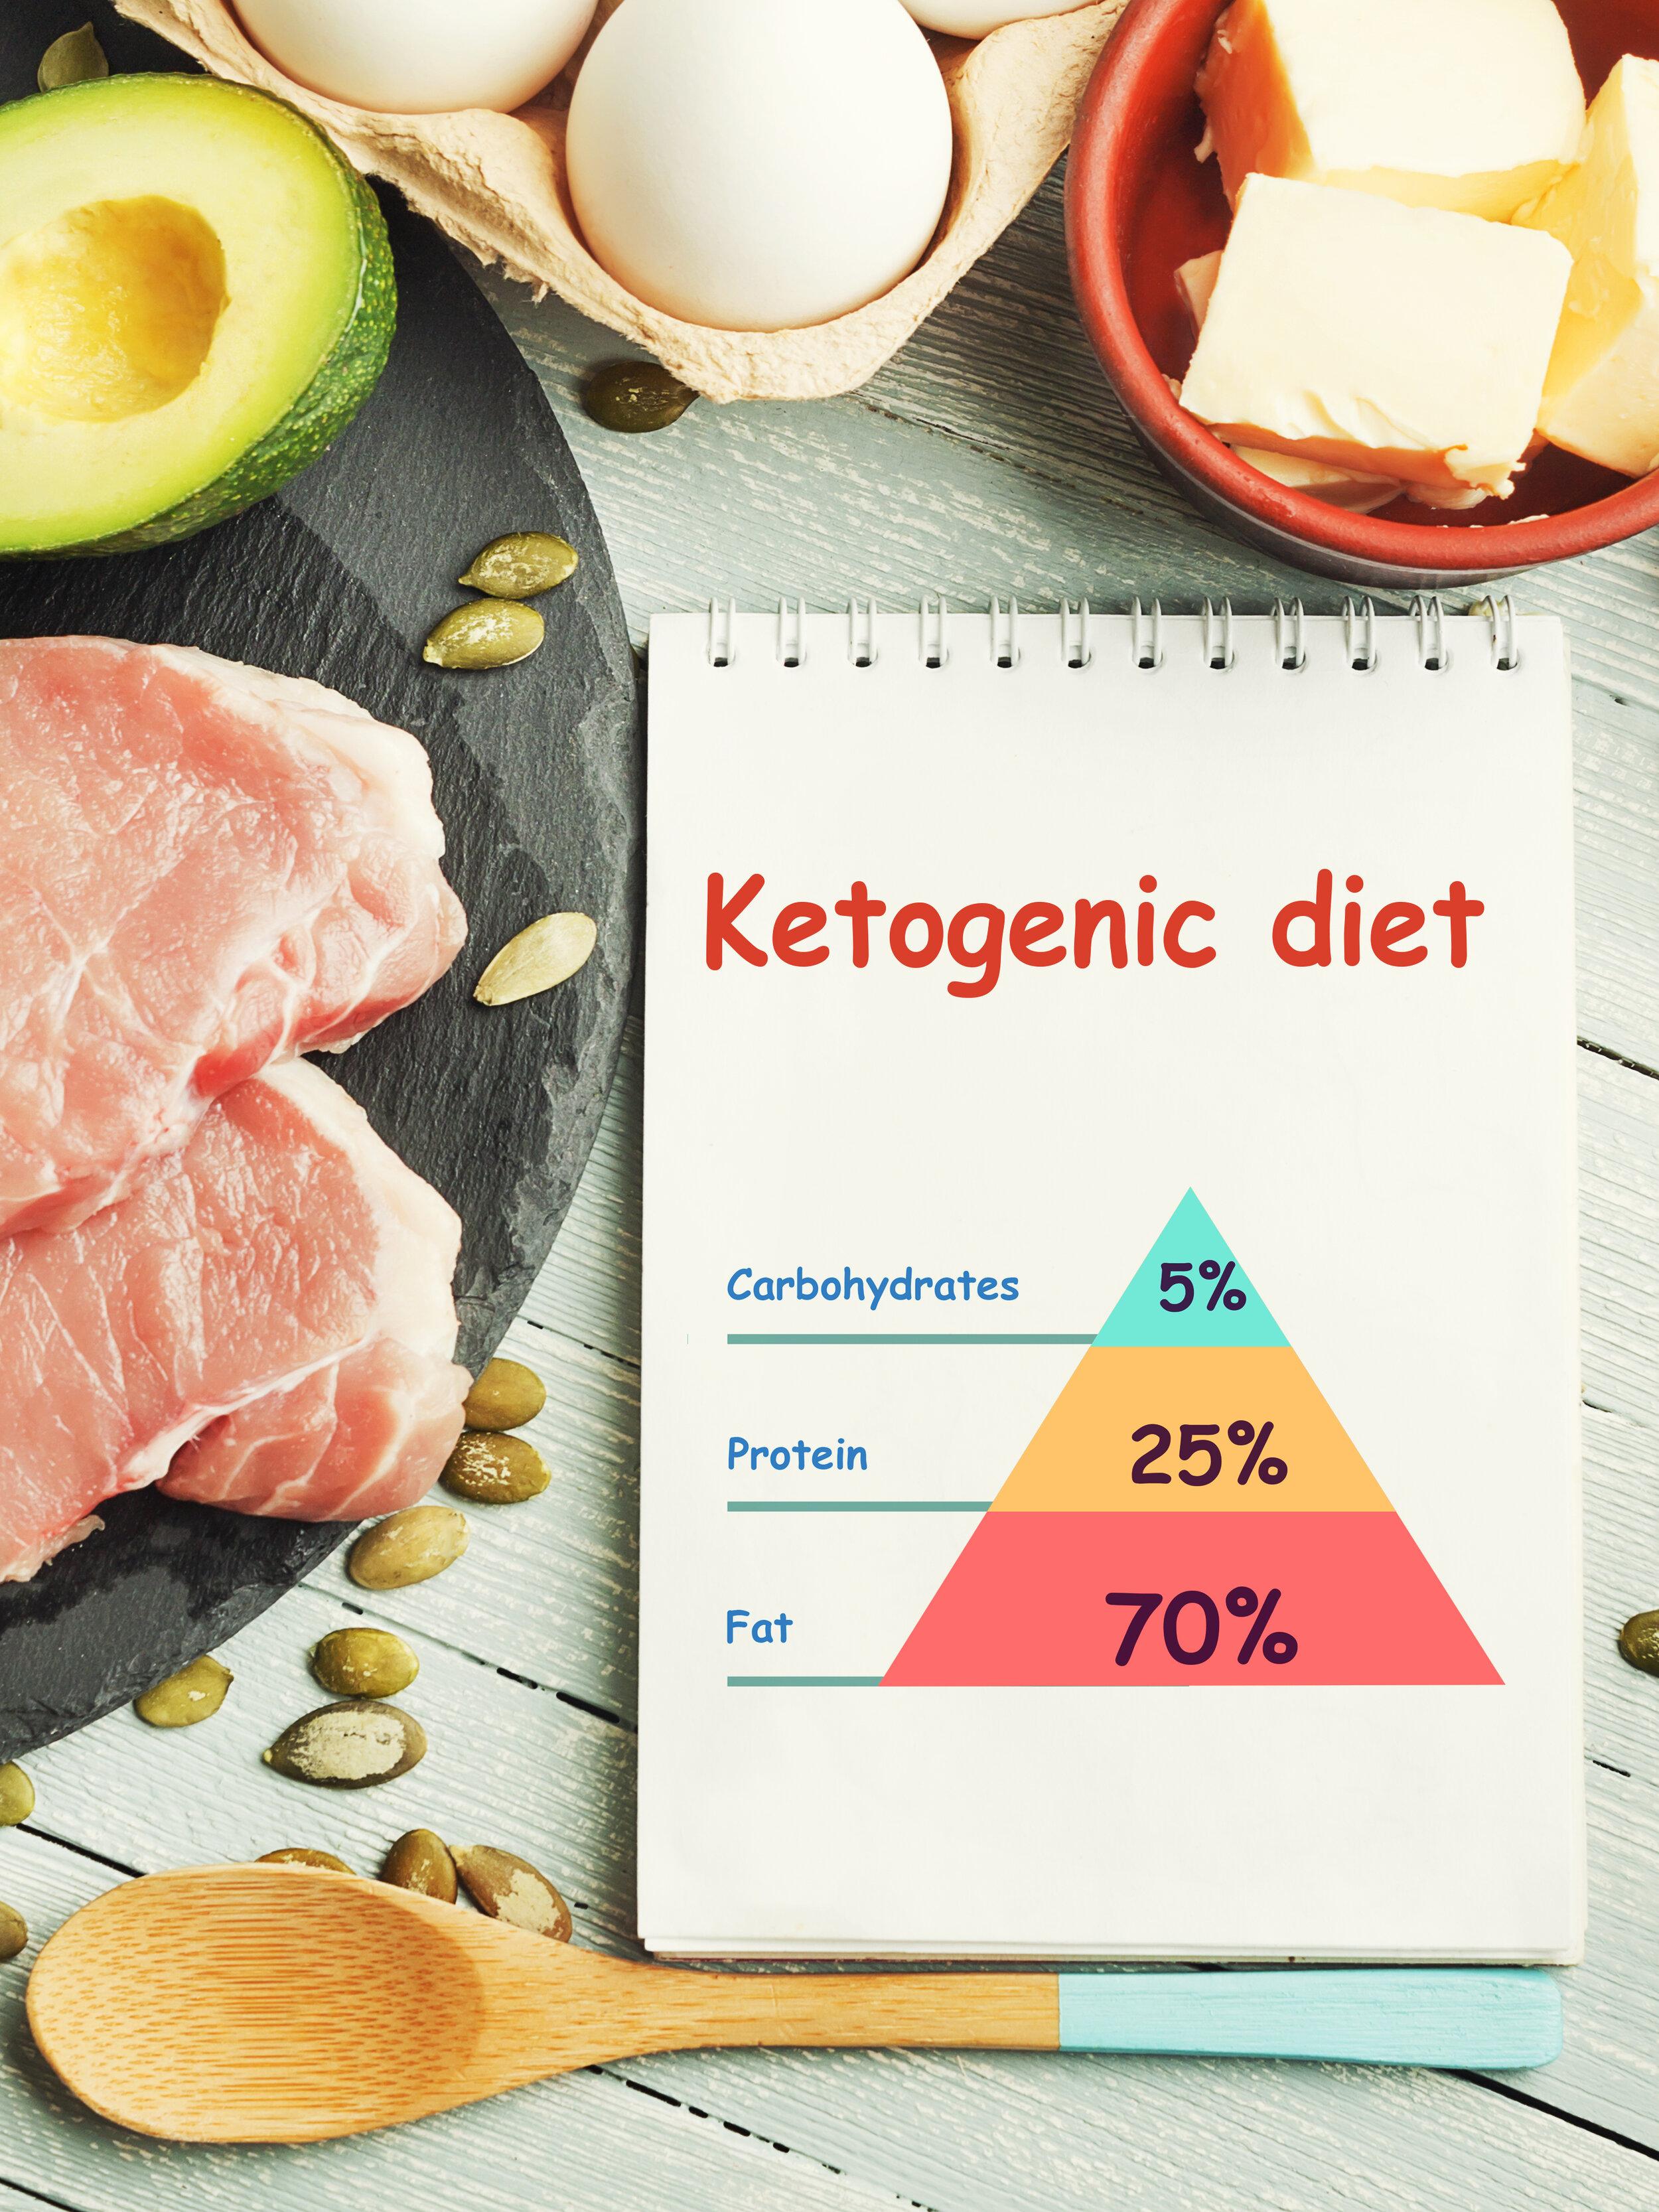 ketogenic diet plan bad for liver